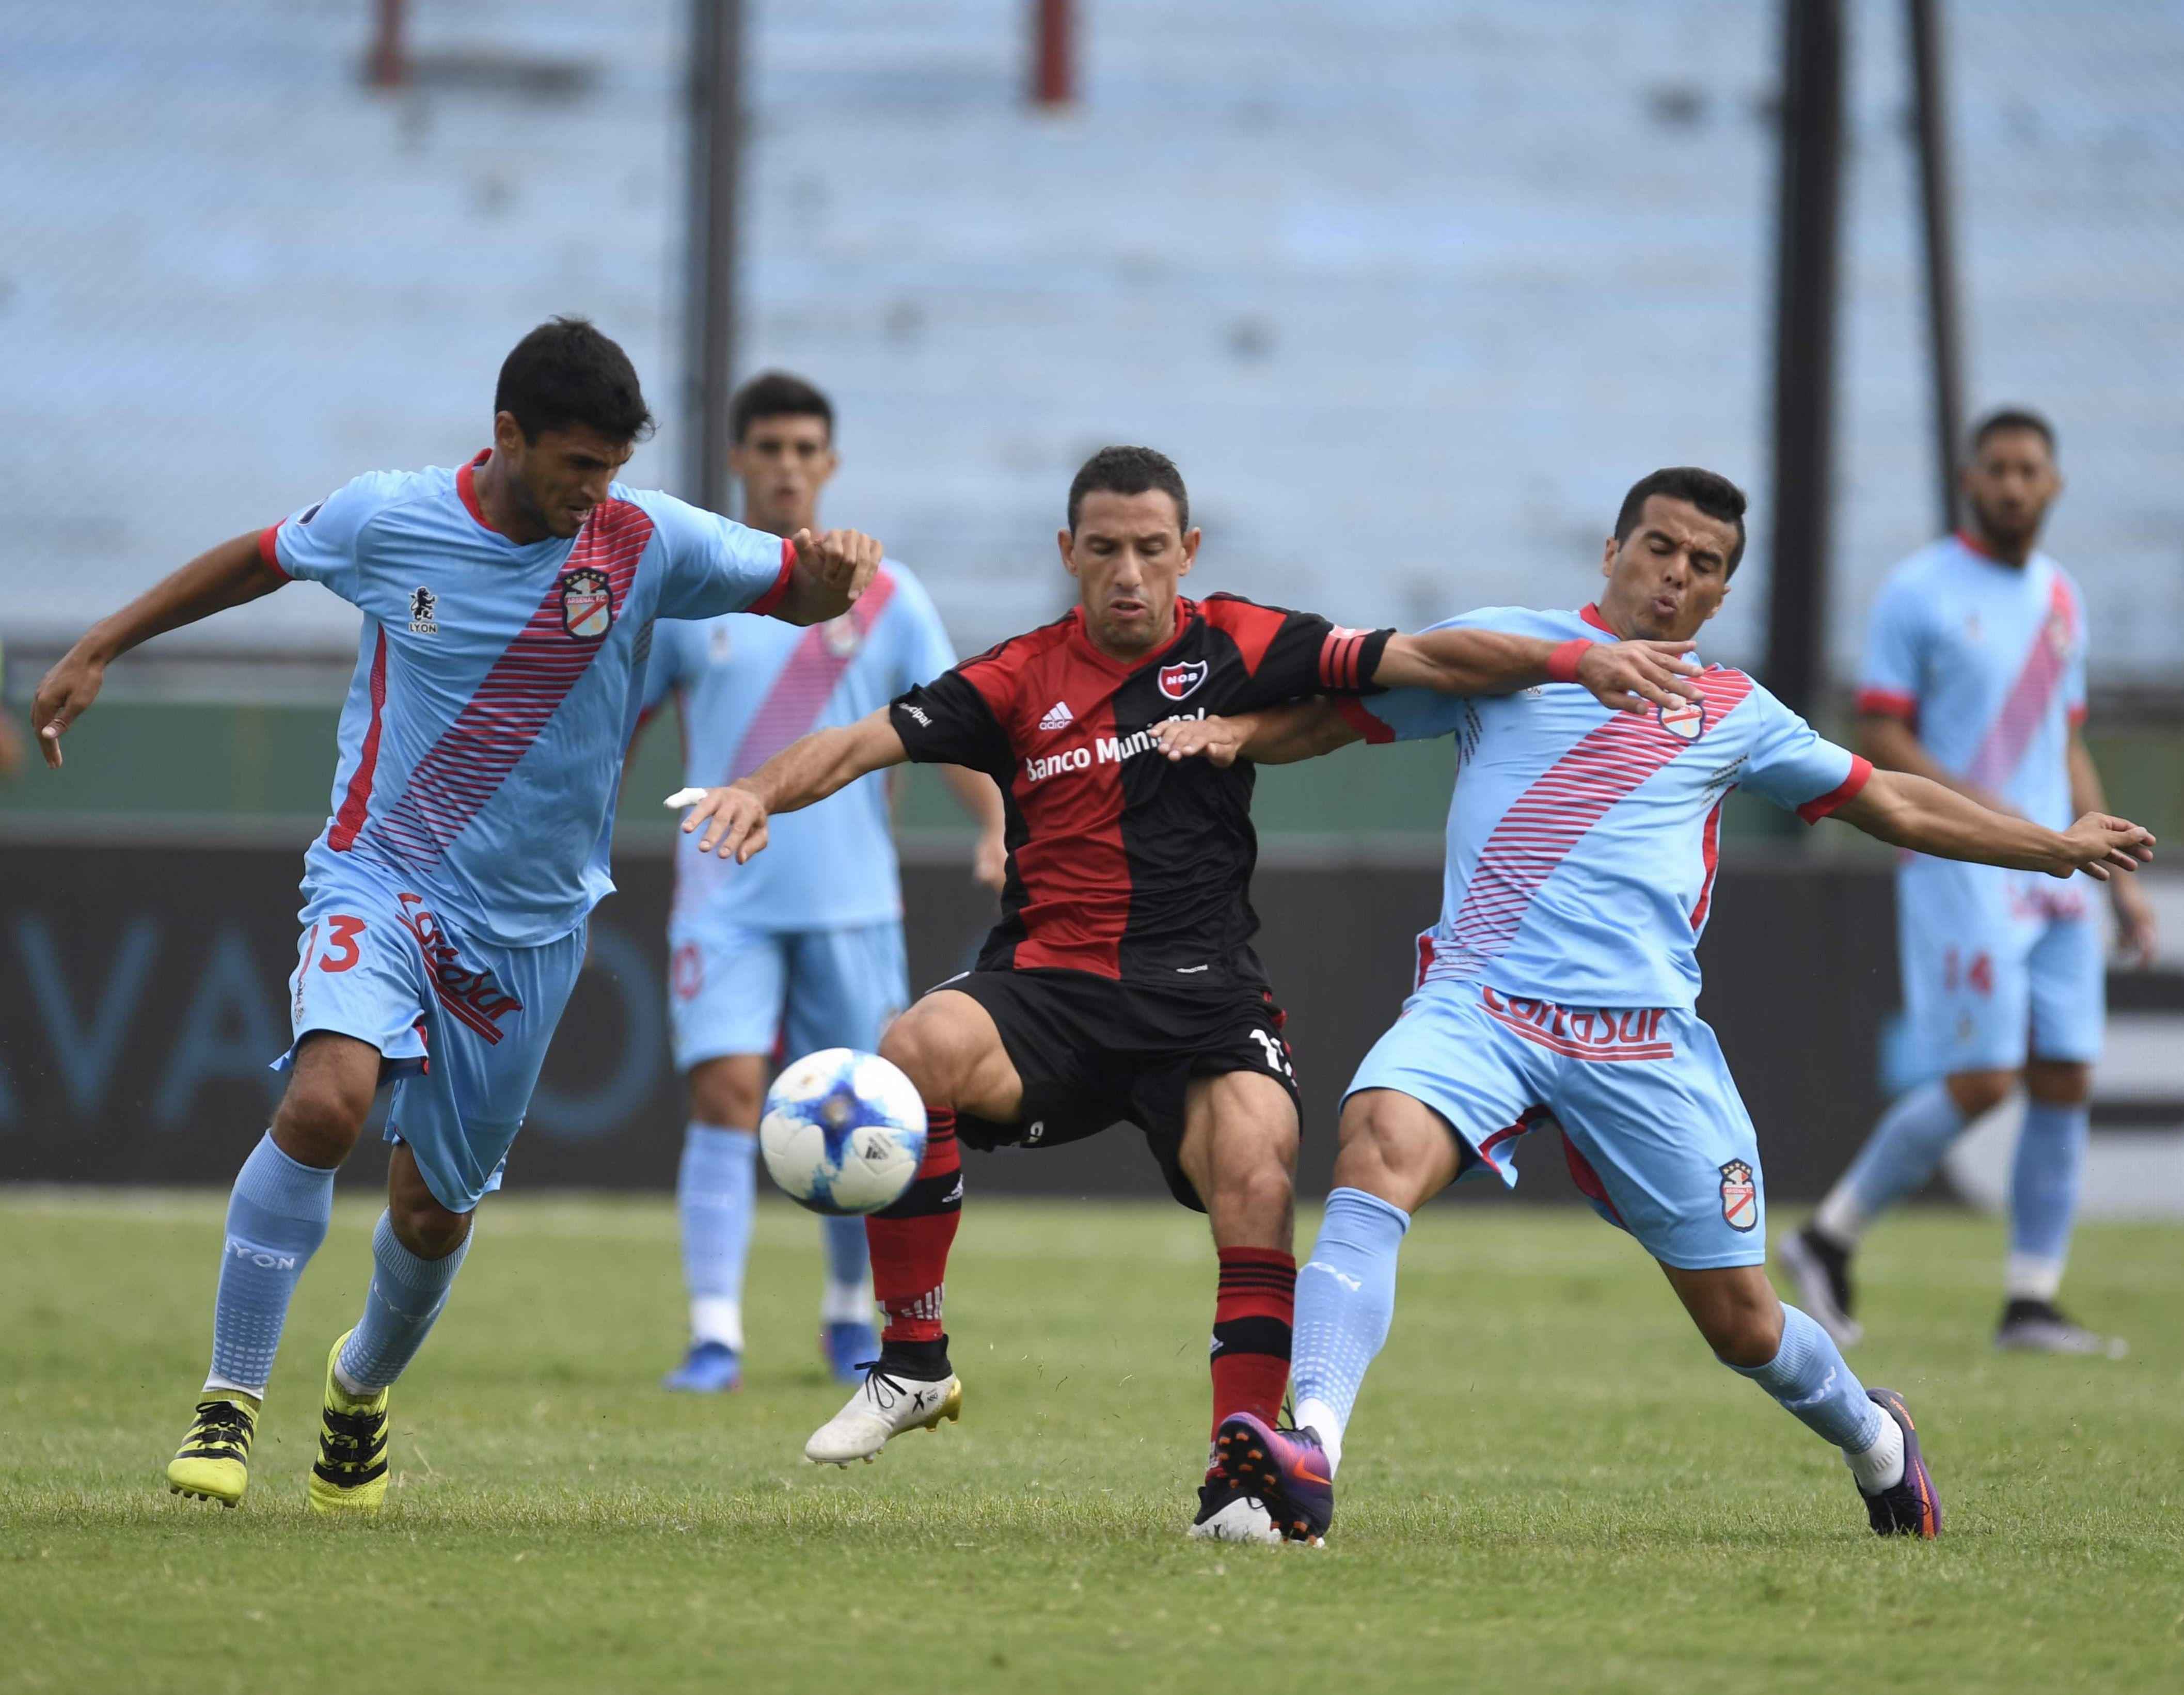 Maxi Rodríguez peleando por la pelota contra dos rivales